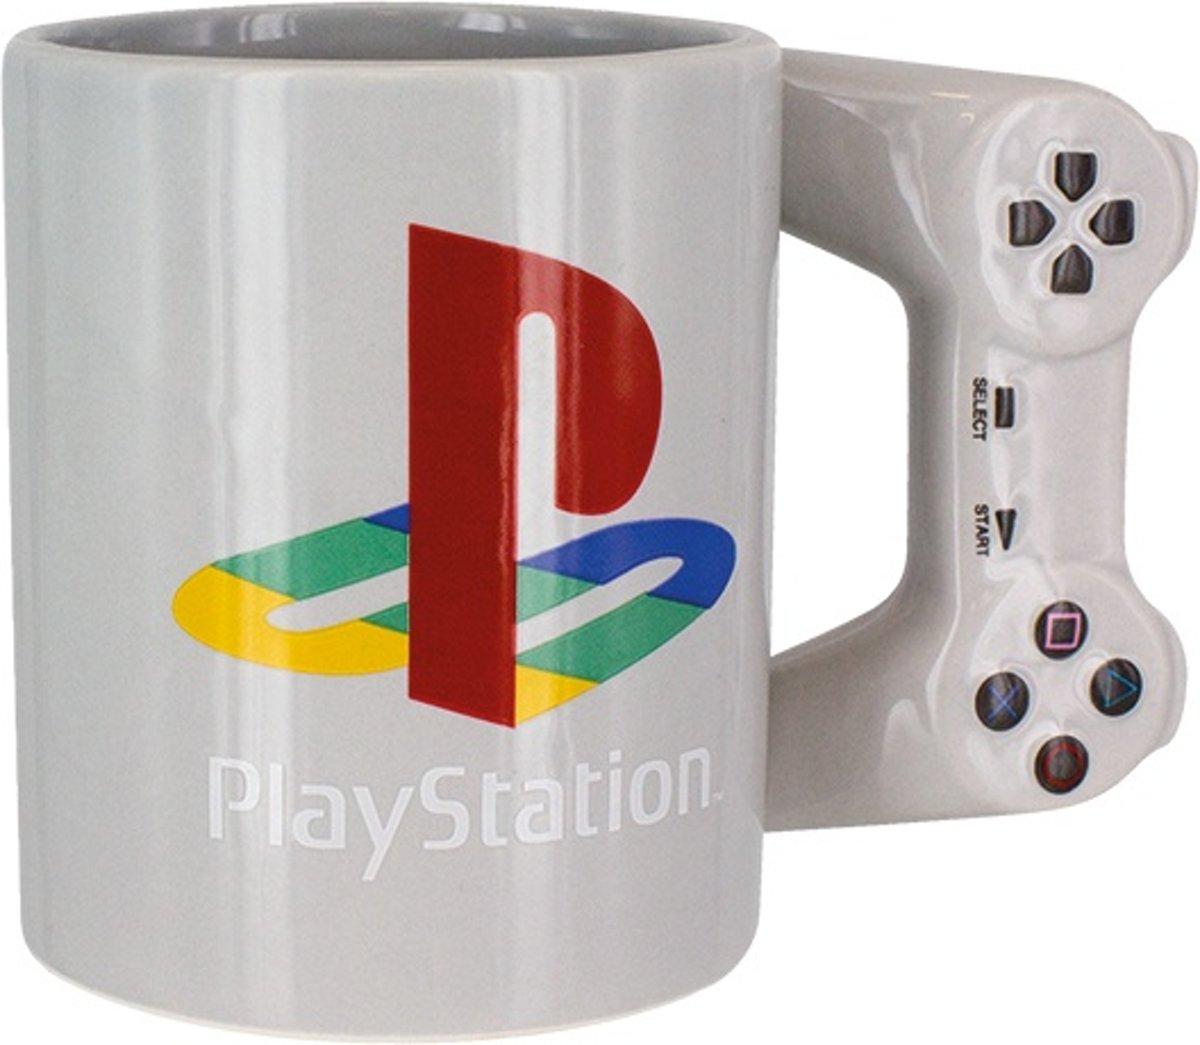 Paladone Playstation Controller Mok 300 Ml